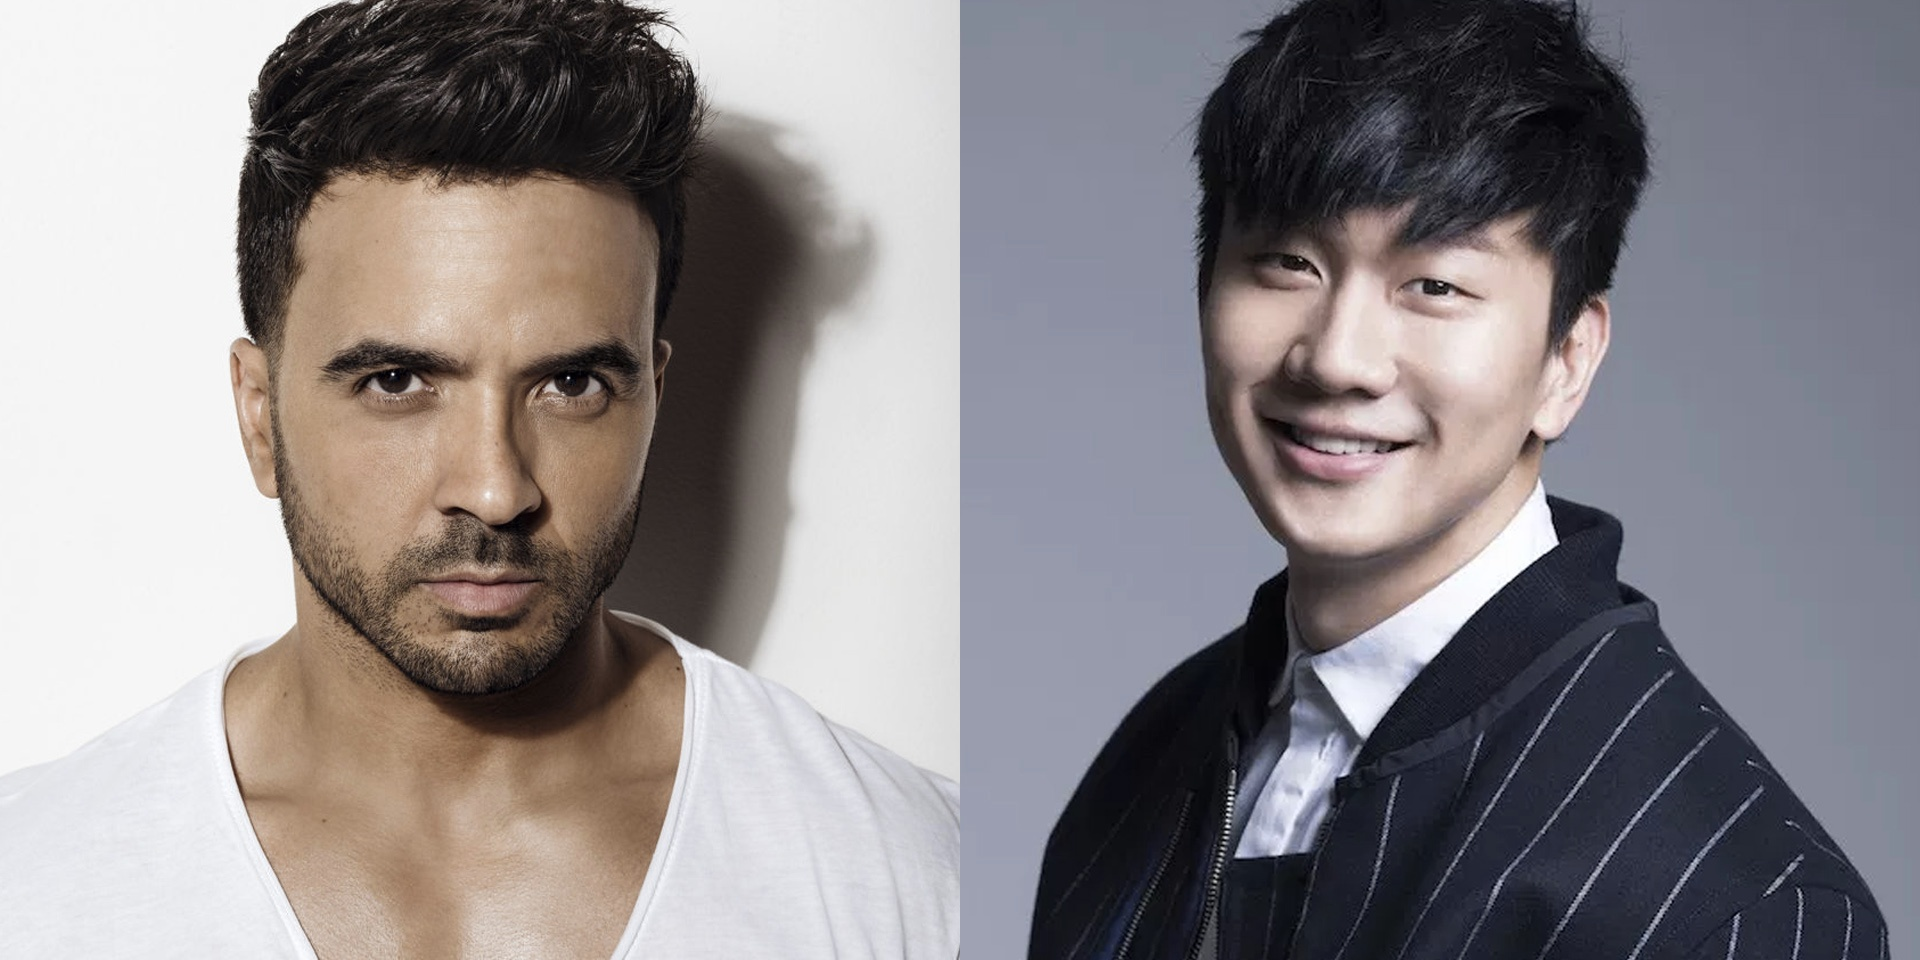 'Despacito' to get Mandarin version featuring JJ Lin